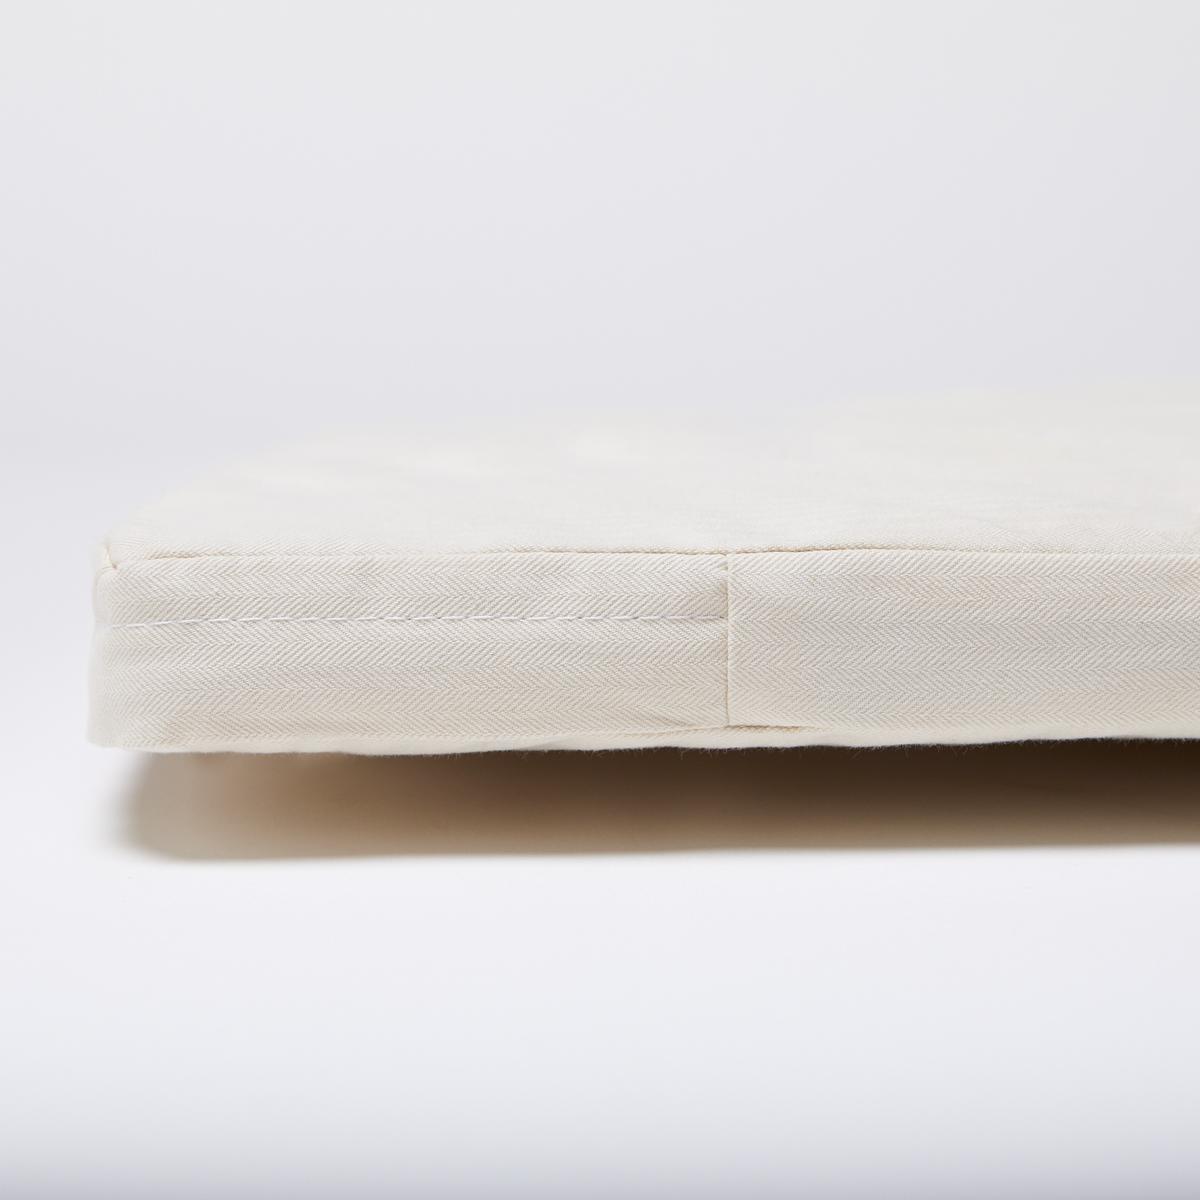 The Little Green Sheep - Natural SnuzPod² Crib Mattress (36x80cm)